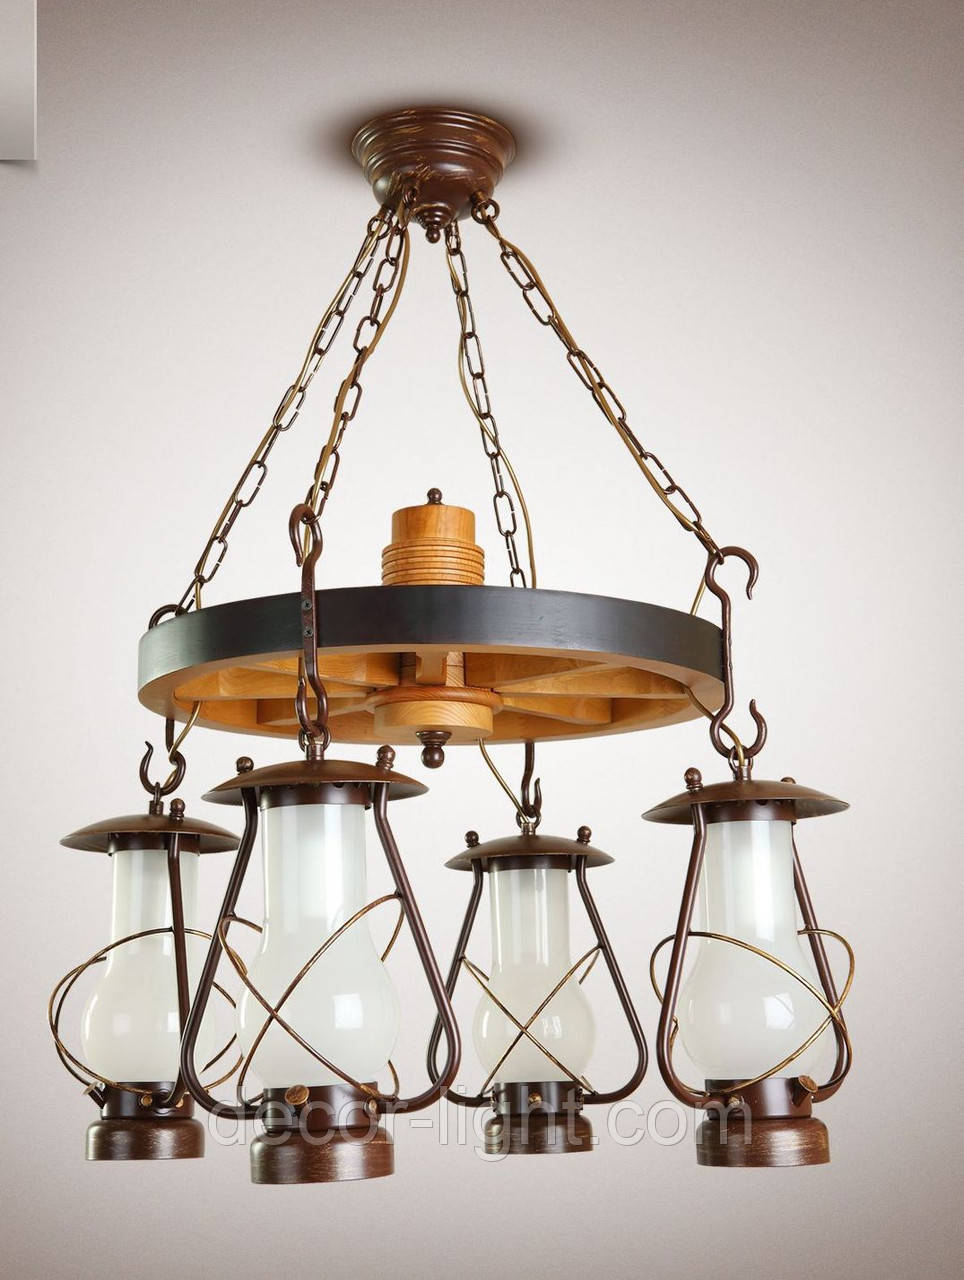 Люстра 4-х ламповая, люстра керосинка, люстра колесо 9404